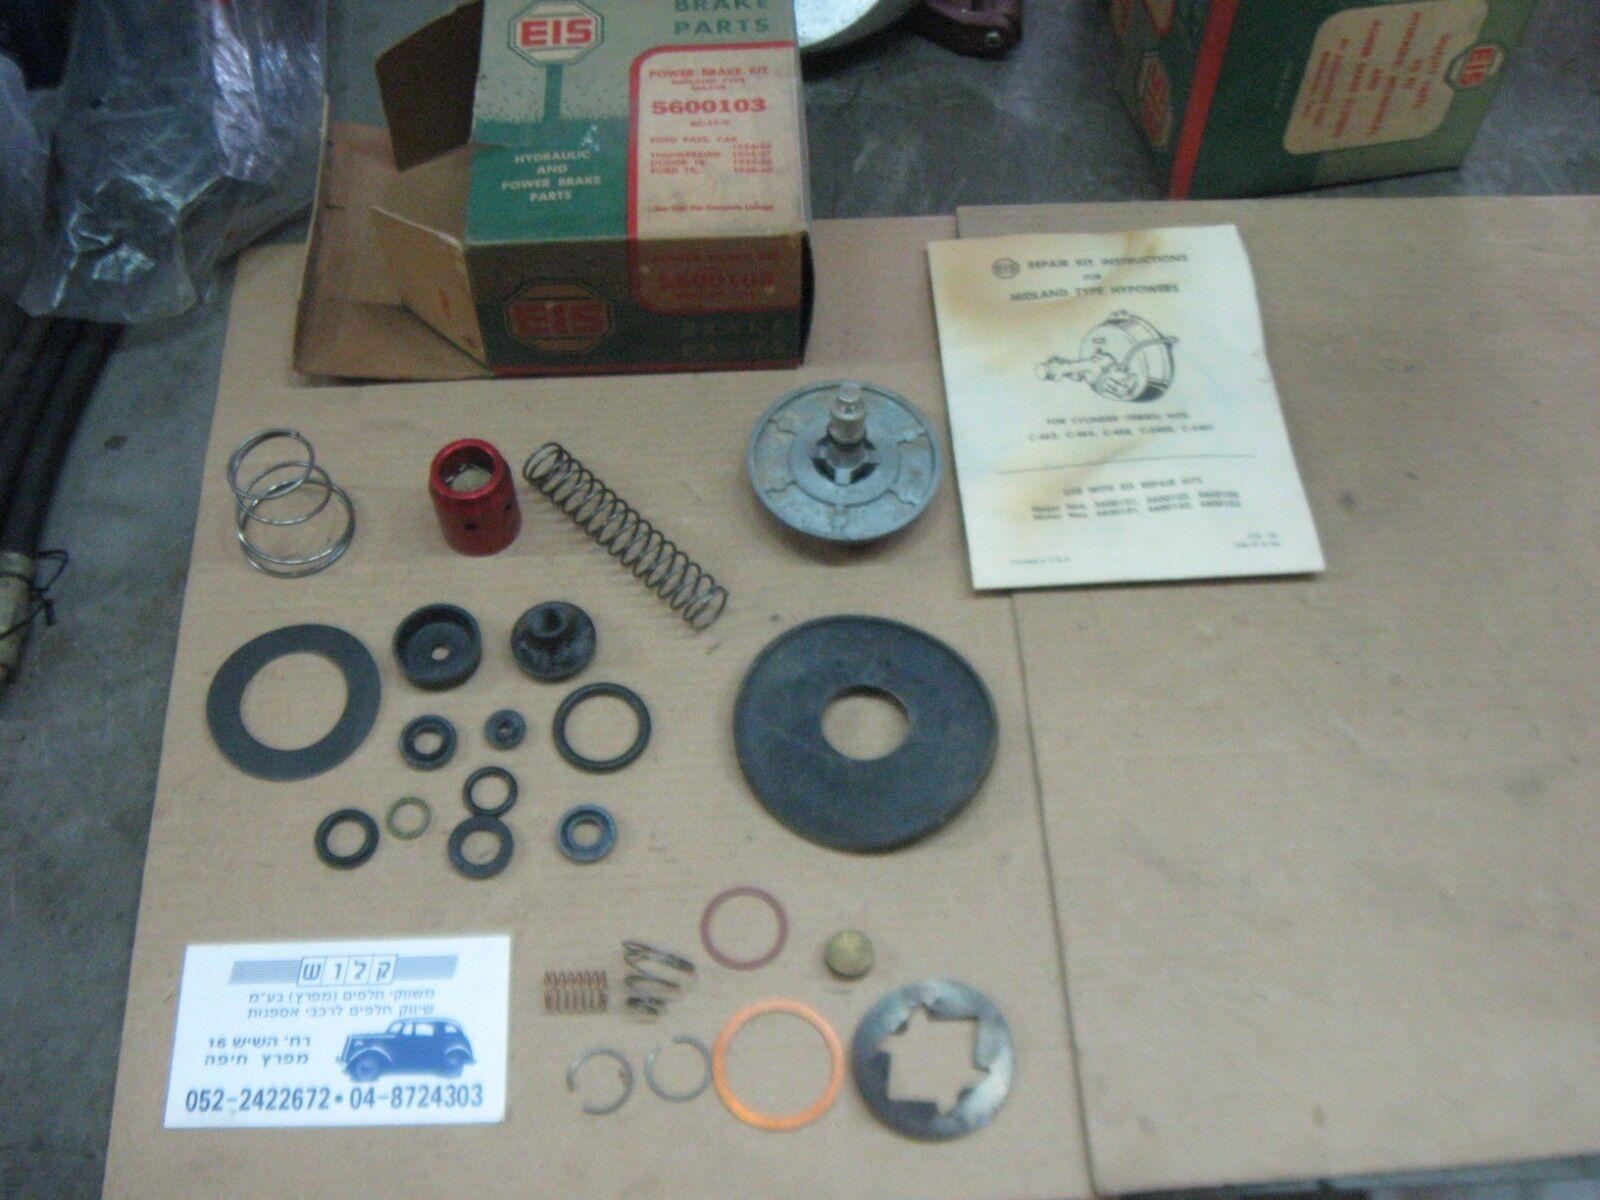 EIS 6600103 POWER BRAKE KIT MIDLAND TYPE MAJOR REPAIR KIT 1954 -1960 THUNDERBIRD